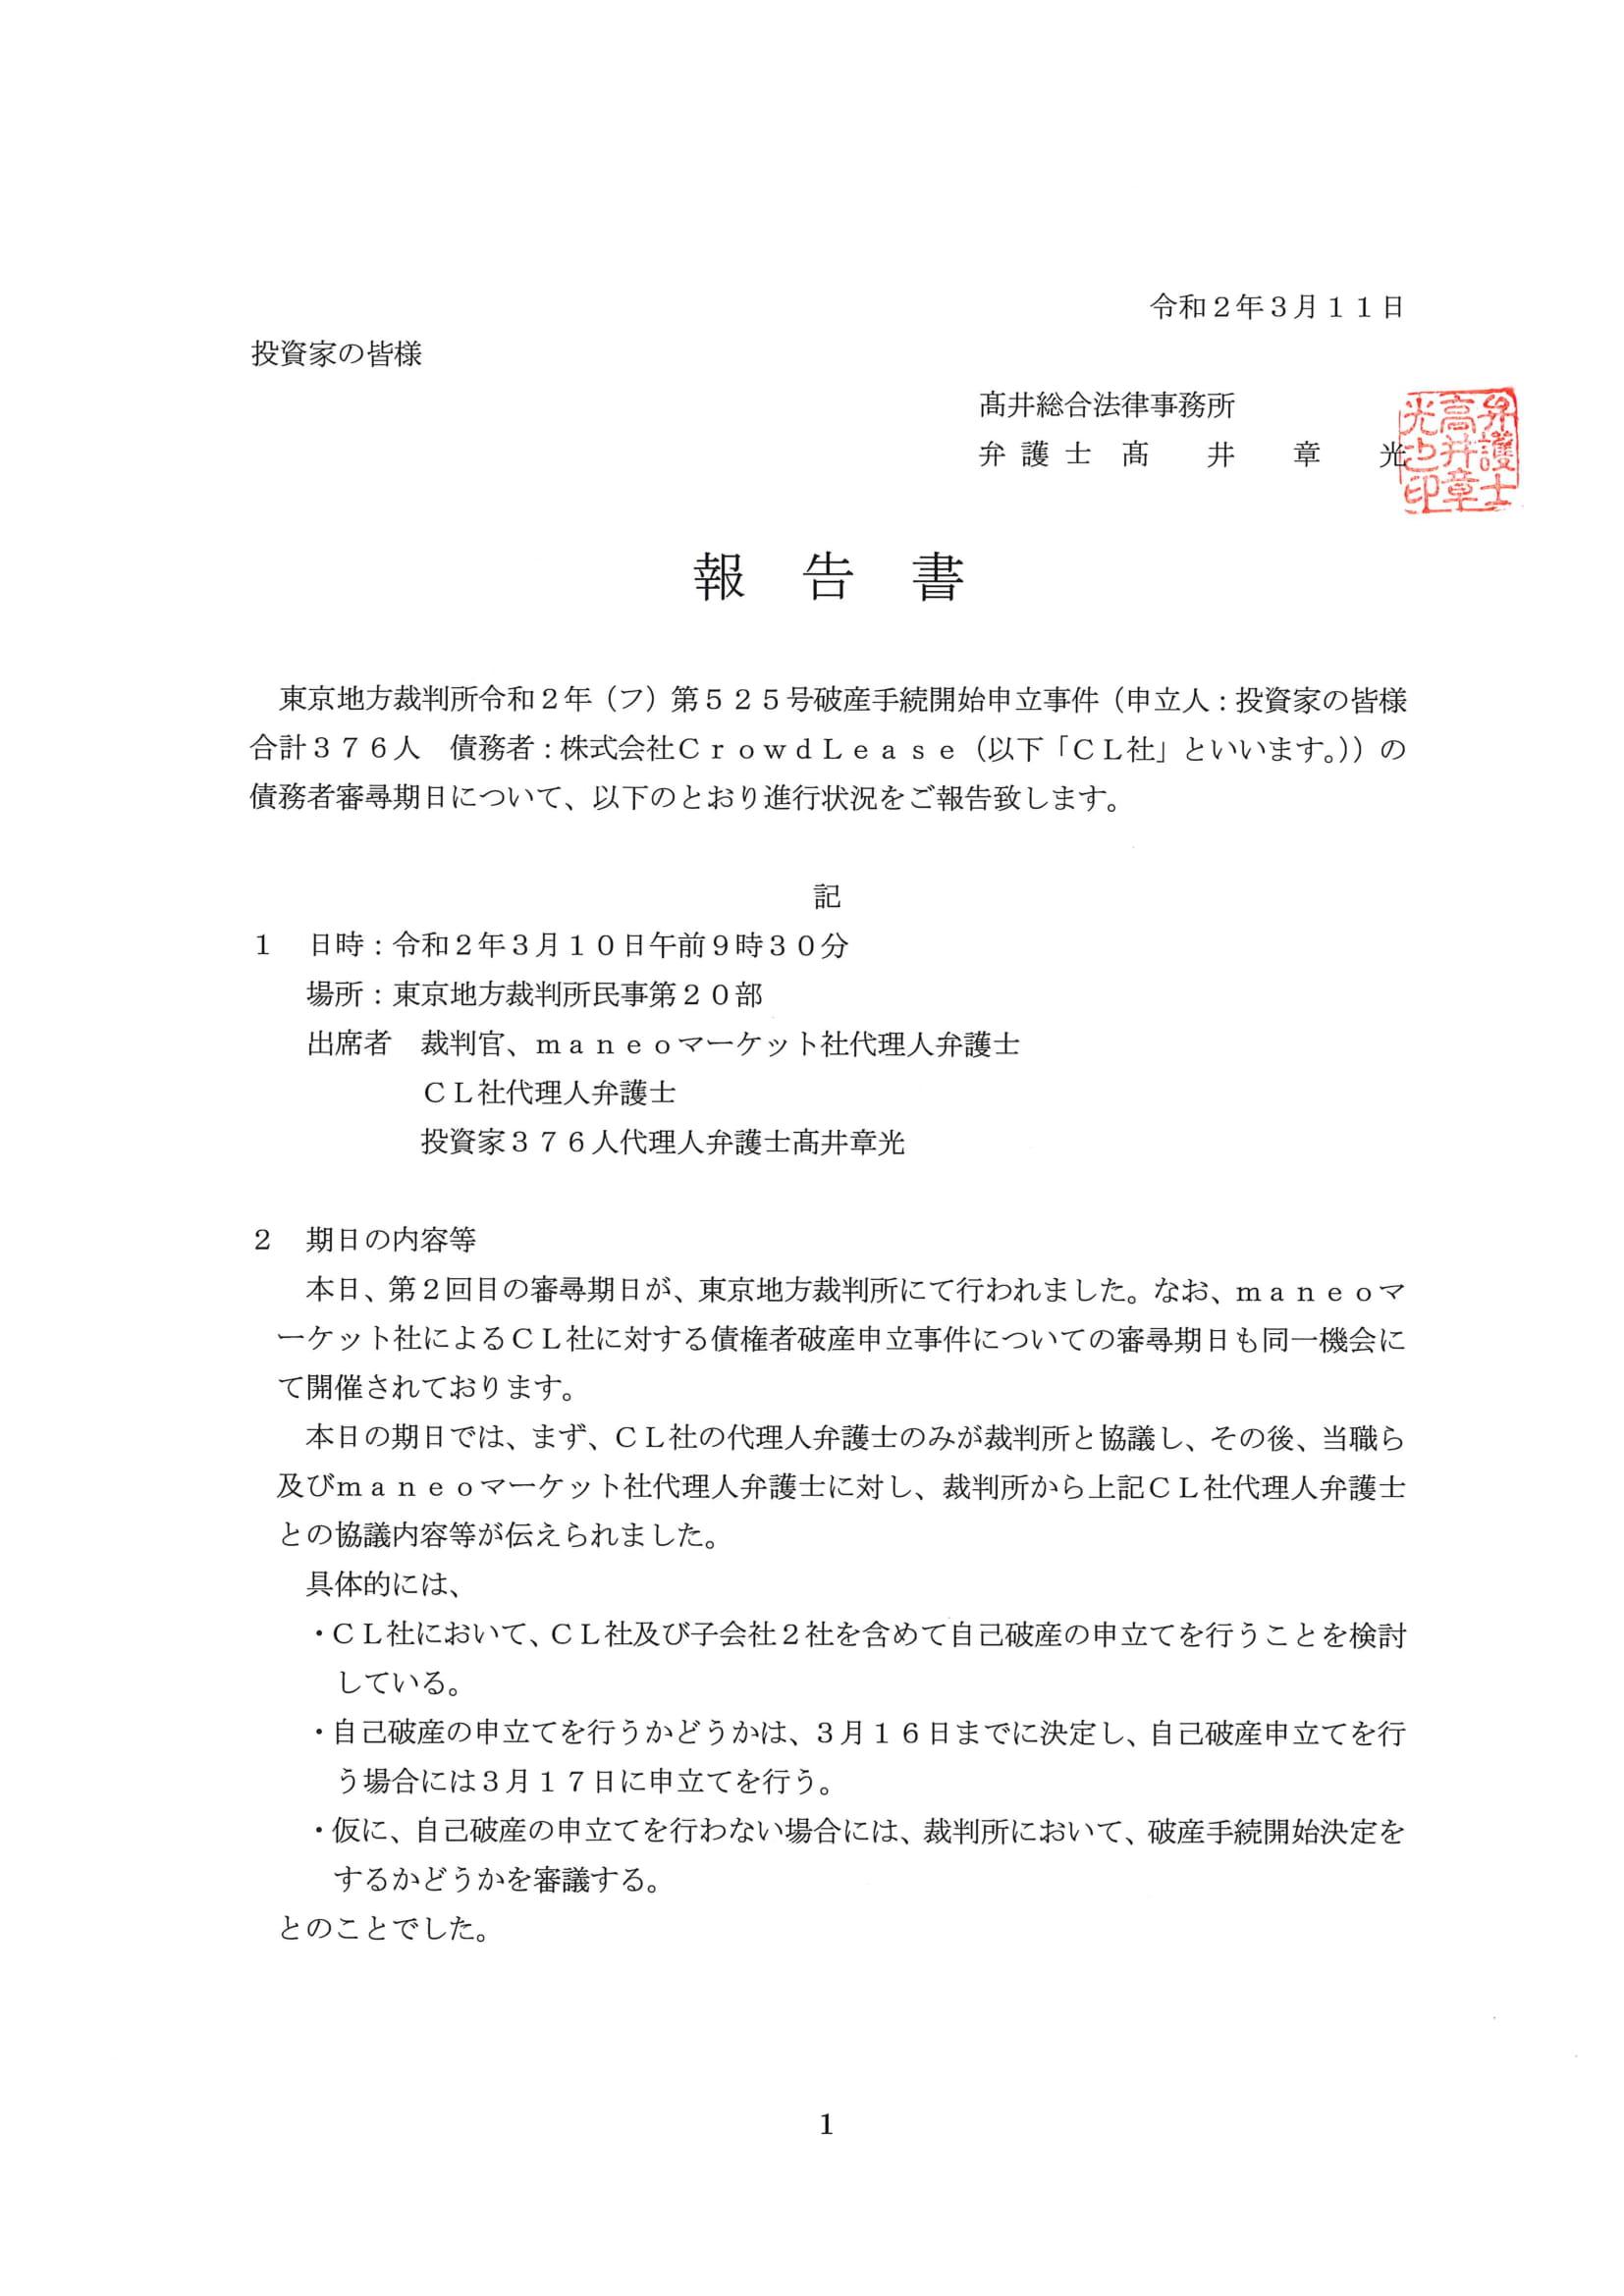 【CL破産申立て】期日報告書(令和2年3月10日)-1